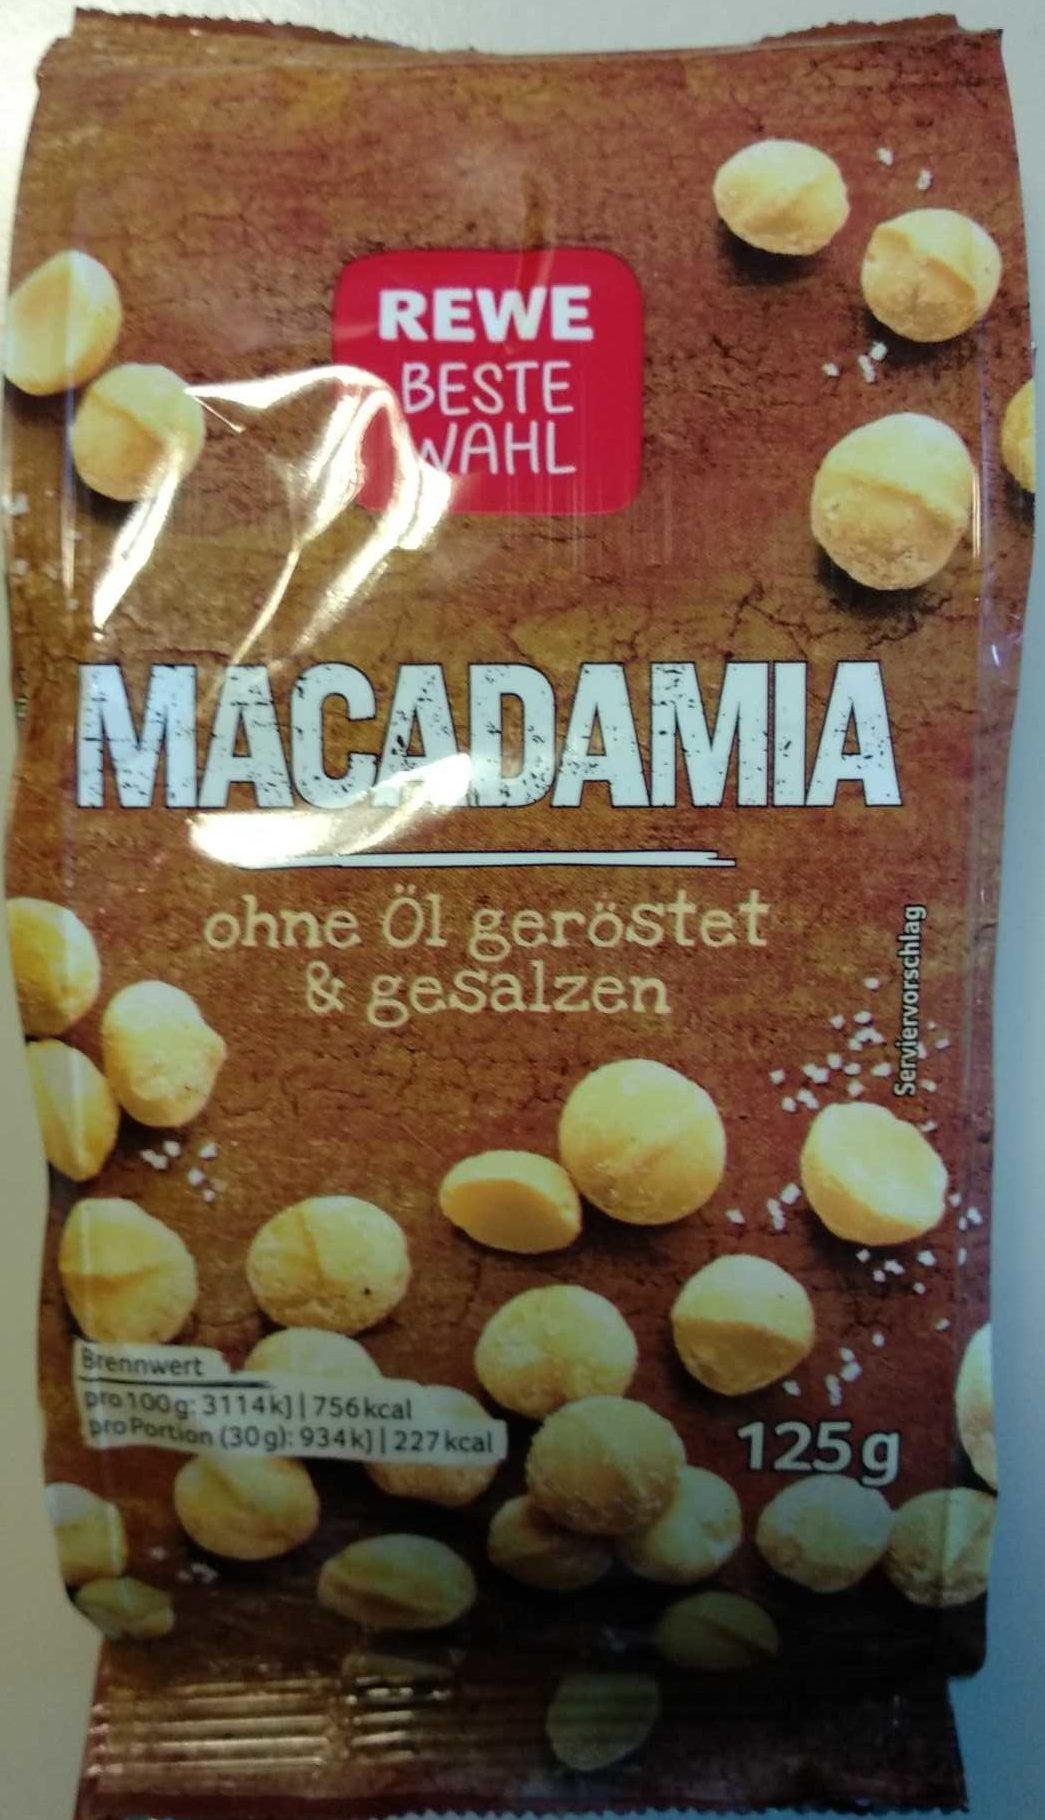 Macadamia ohne Öl geröstet & gesalzen - Produit - de